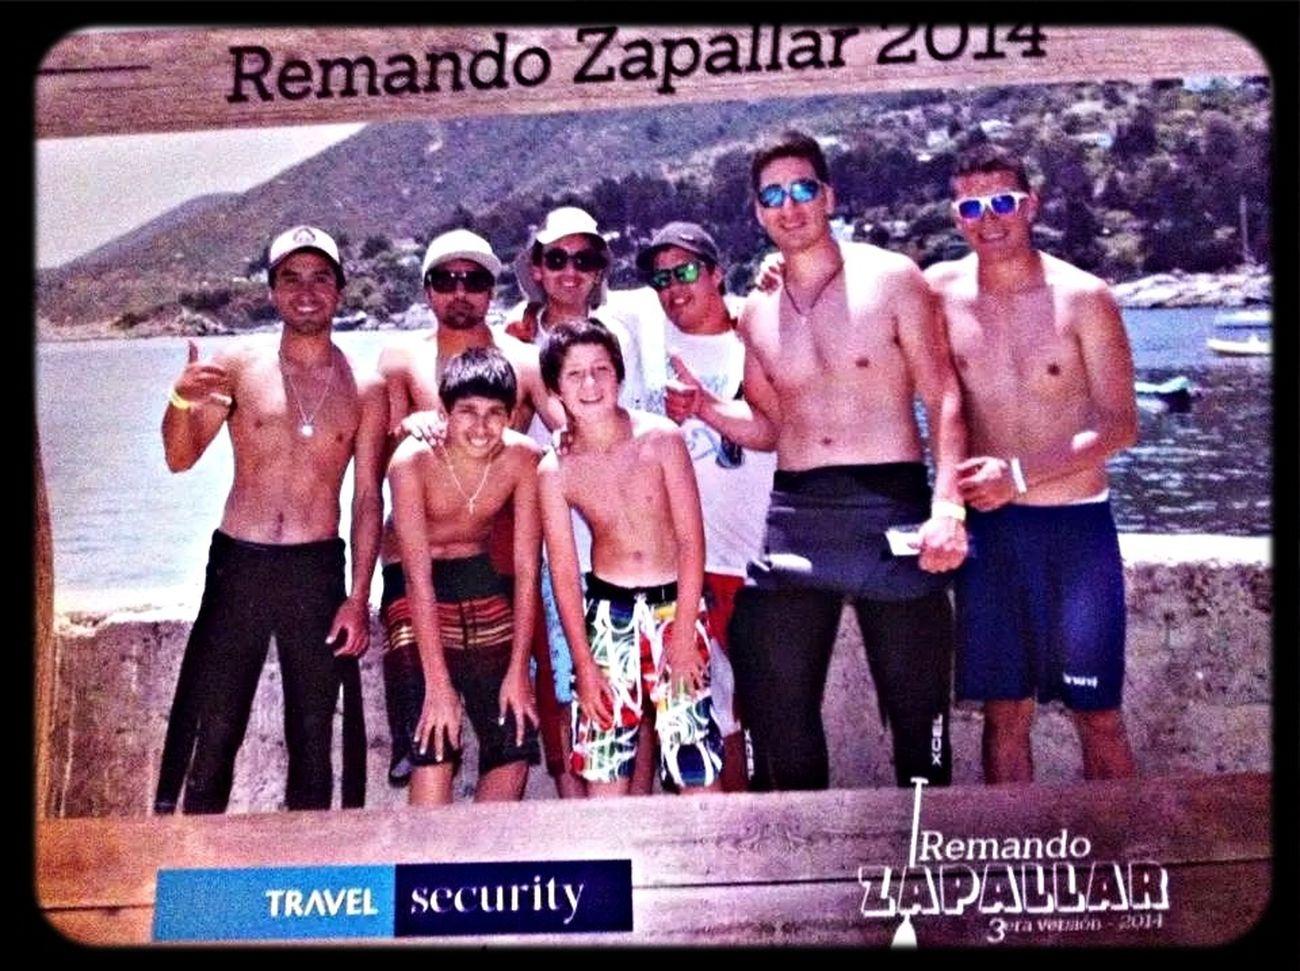 Remando zapallar 2014 ?? Taking Photos Summer2014 Summerismagic Friends